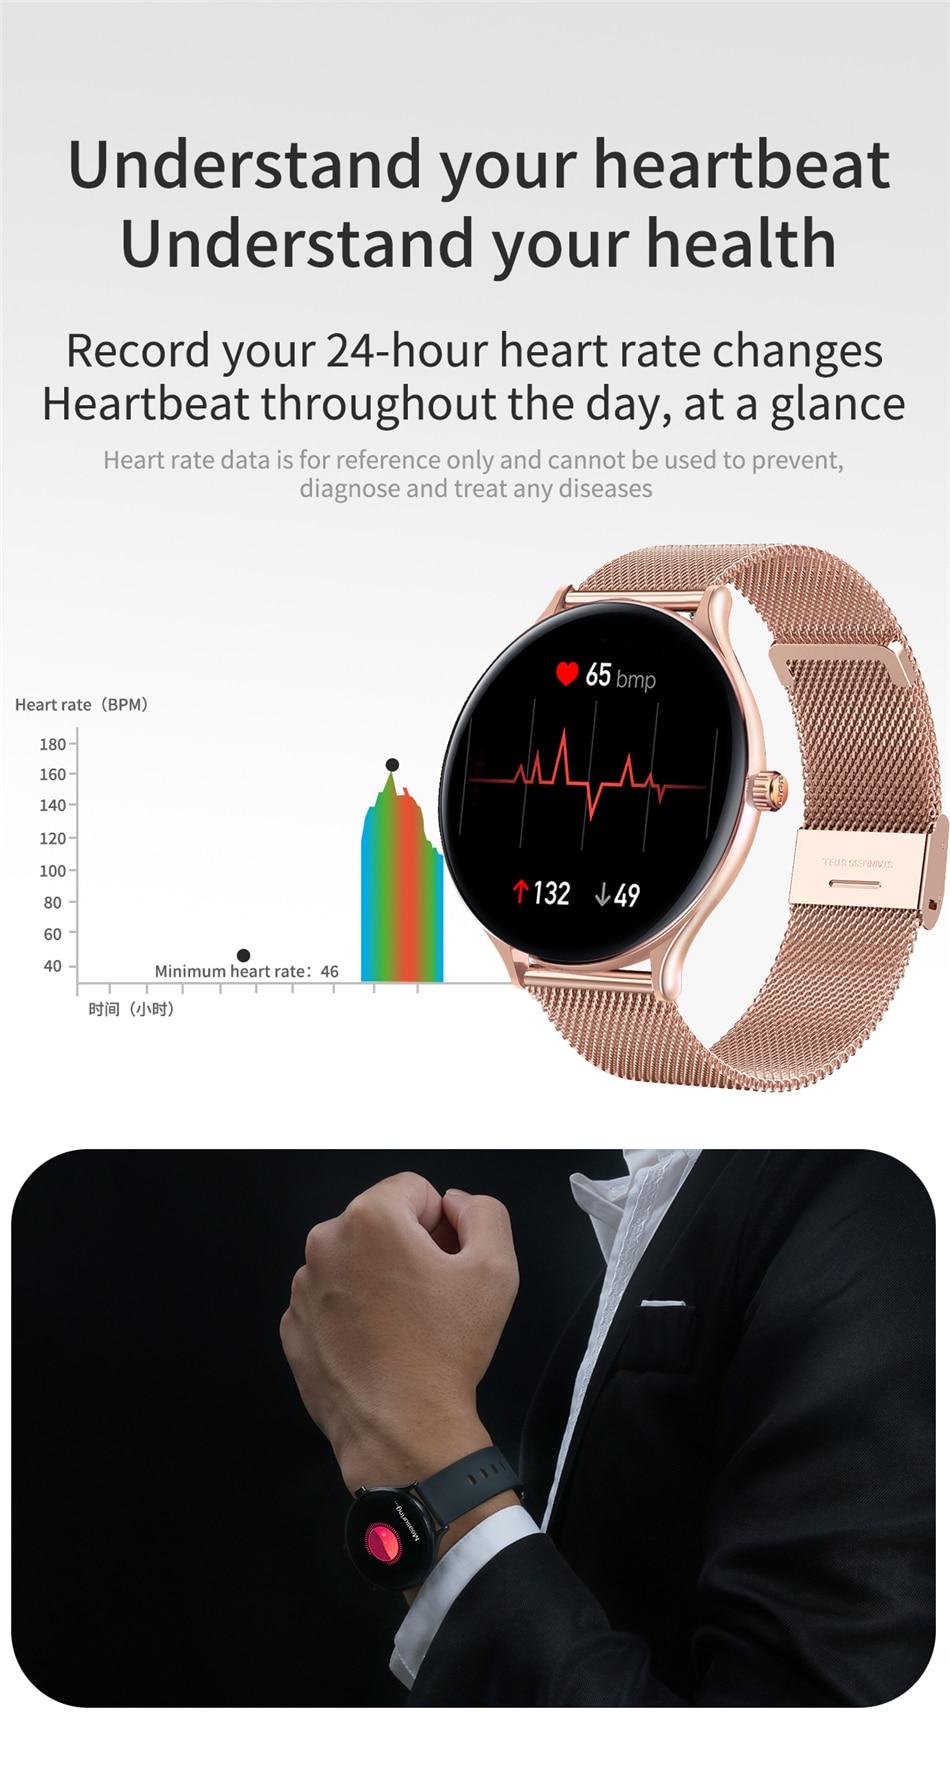 H1fa1763d1d7a4568b7b9798077122a49J 2021 New Full circle touch screen Women smart watch Luxury steel Watch Band Fashion smartwatch Sport Activity tracker For Xiaomi